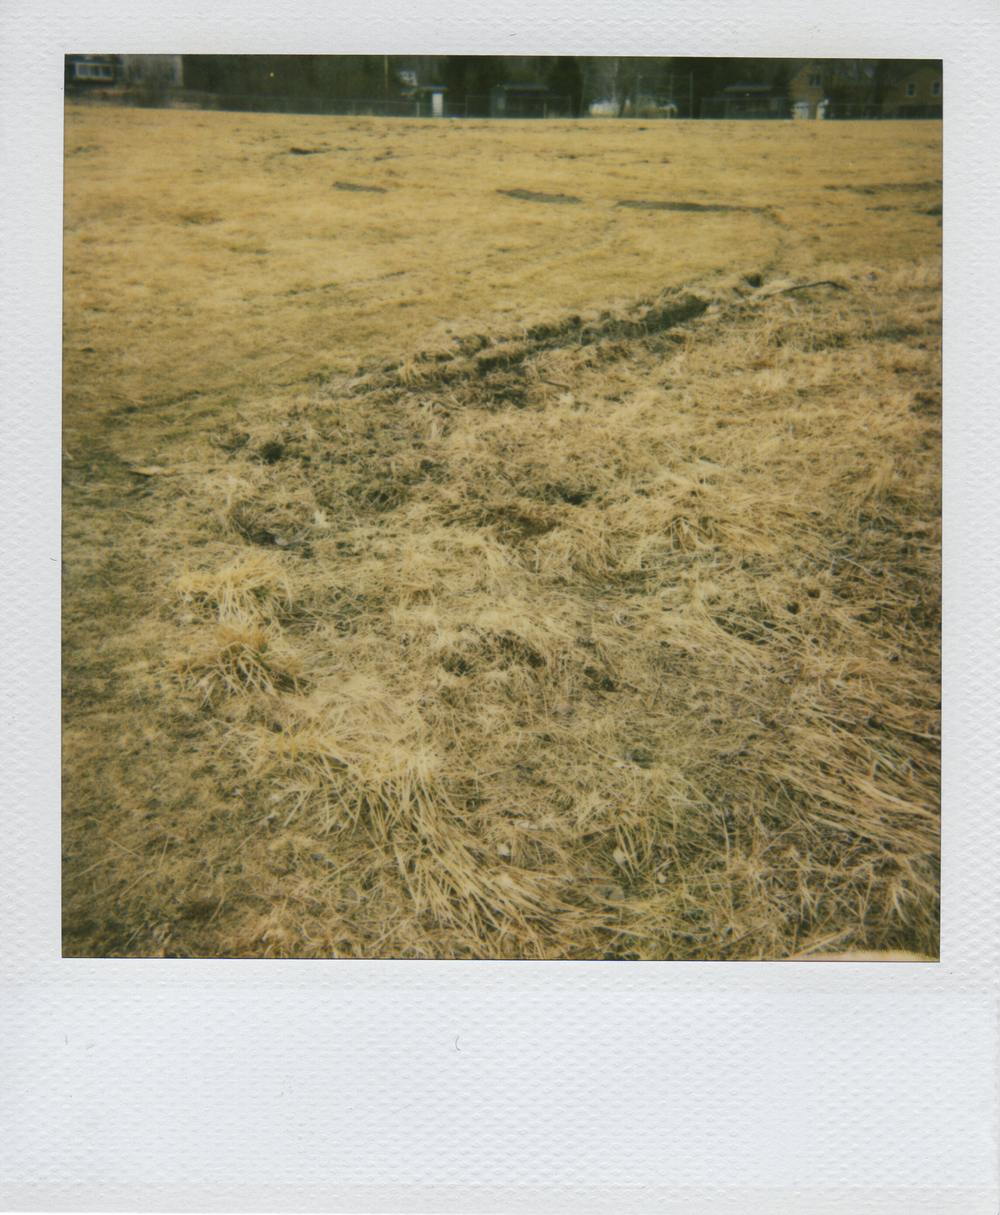 jlaurence-polaroid-043.jpg